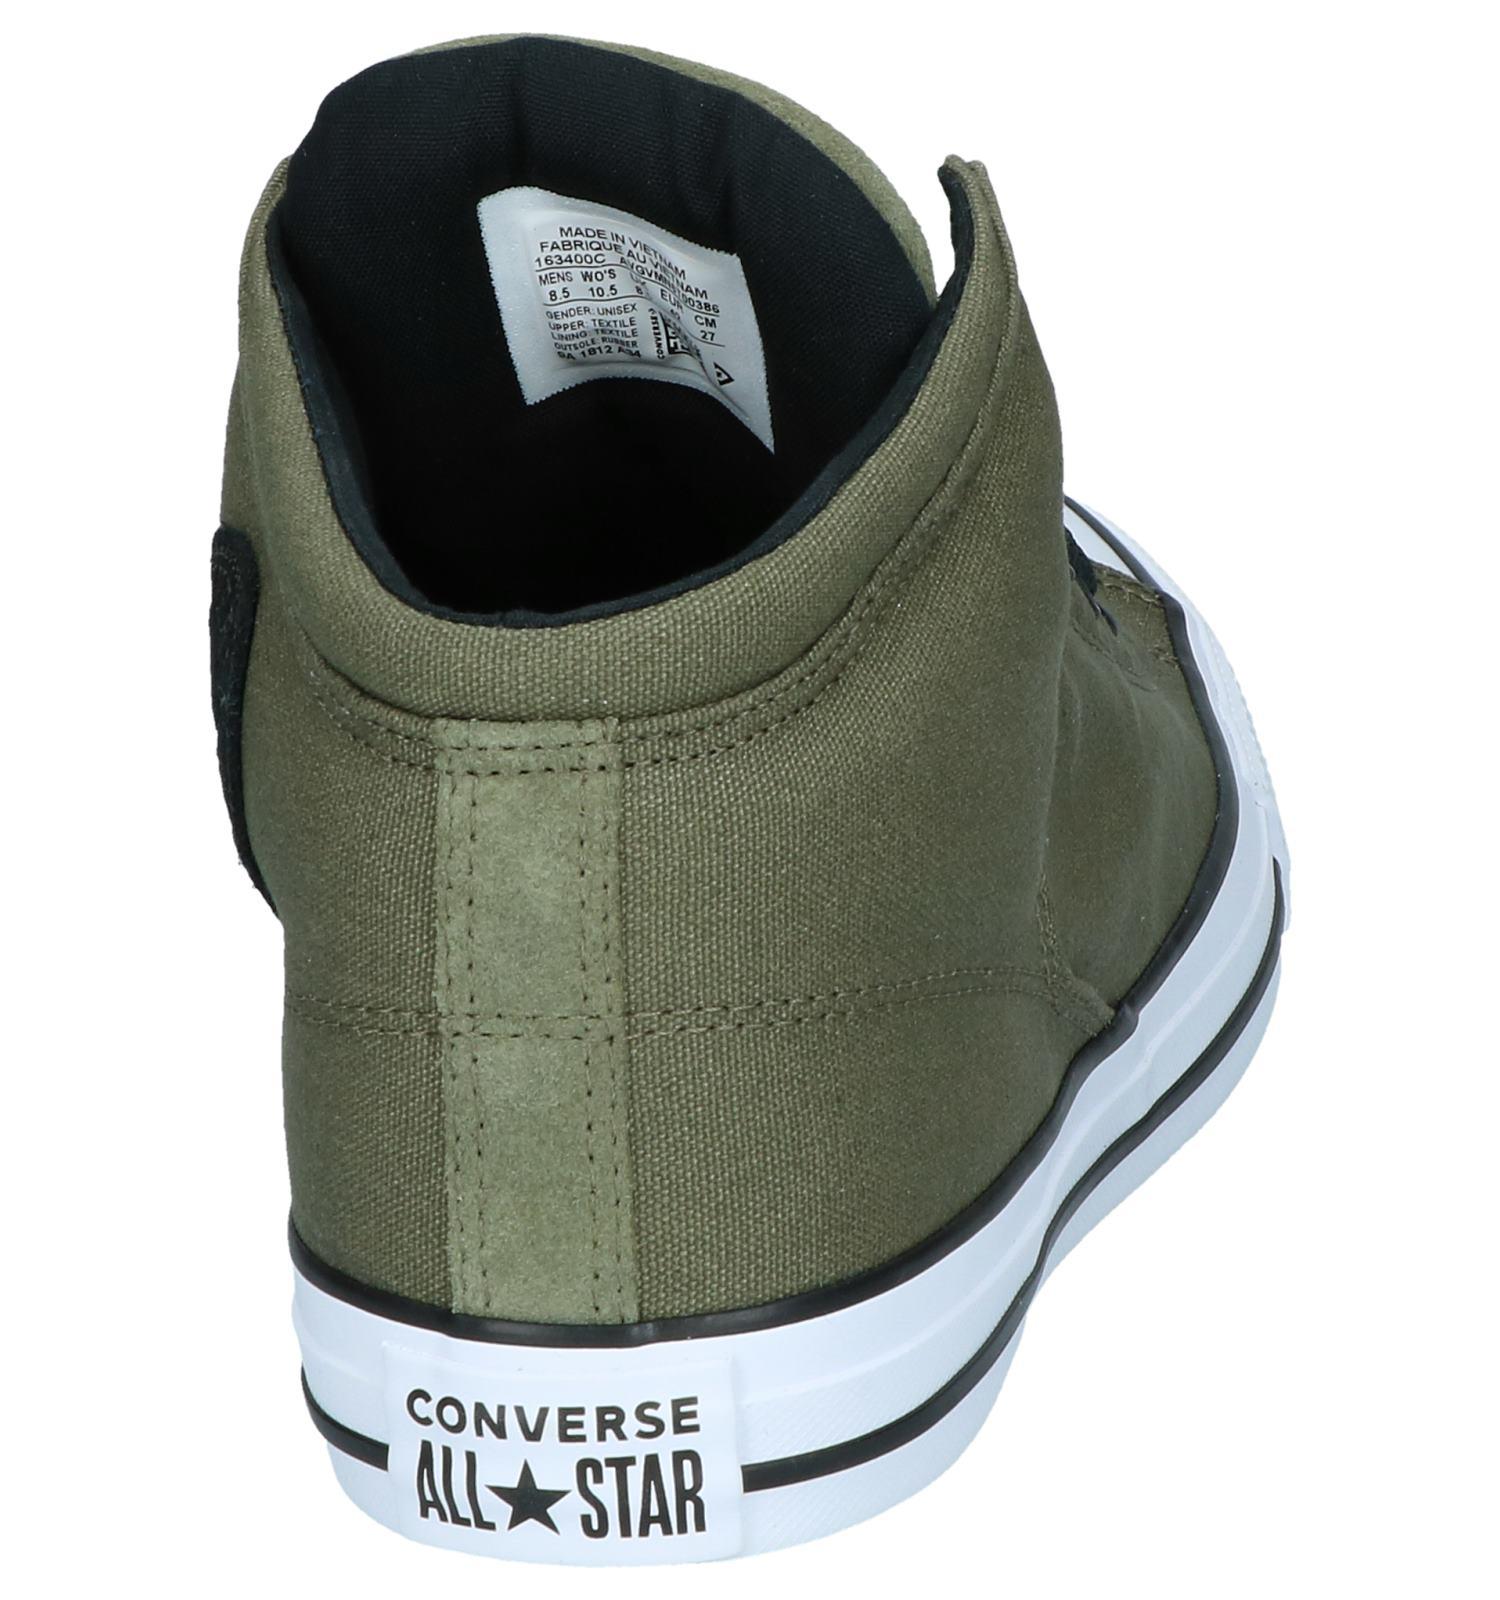 c6cd2d905b7 Kaki Hoge Sneakers Converse Chuck Taylor AS High Street | TORFS.BE | Gratis  verzend en retour